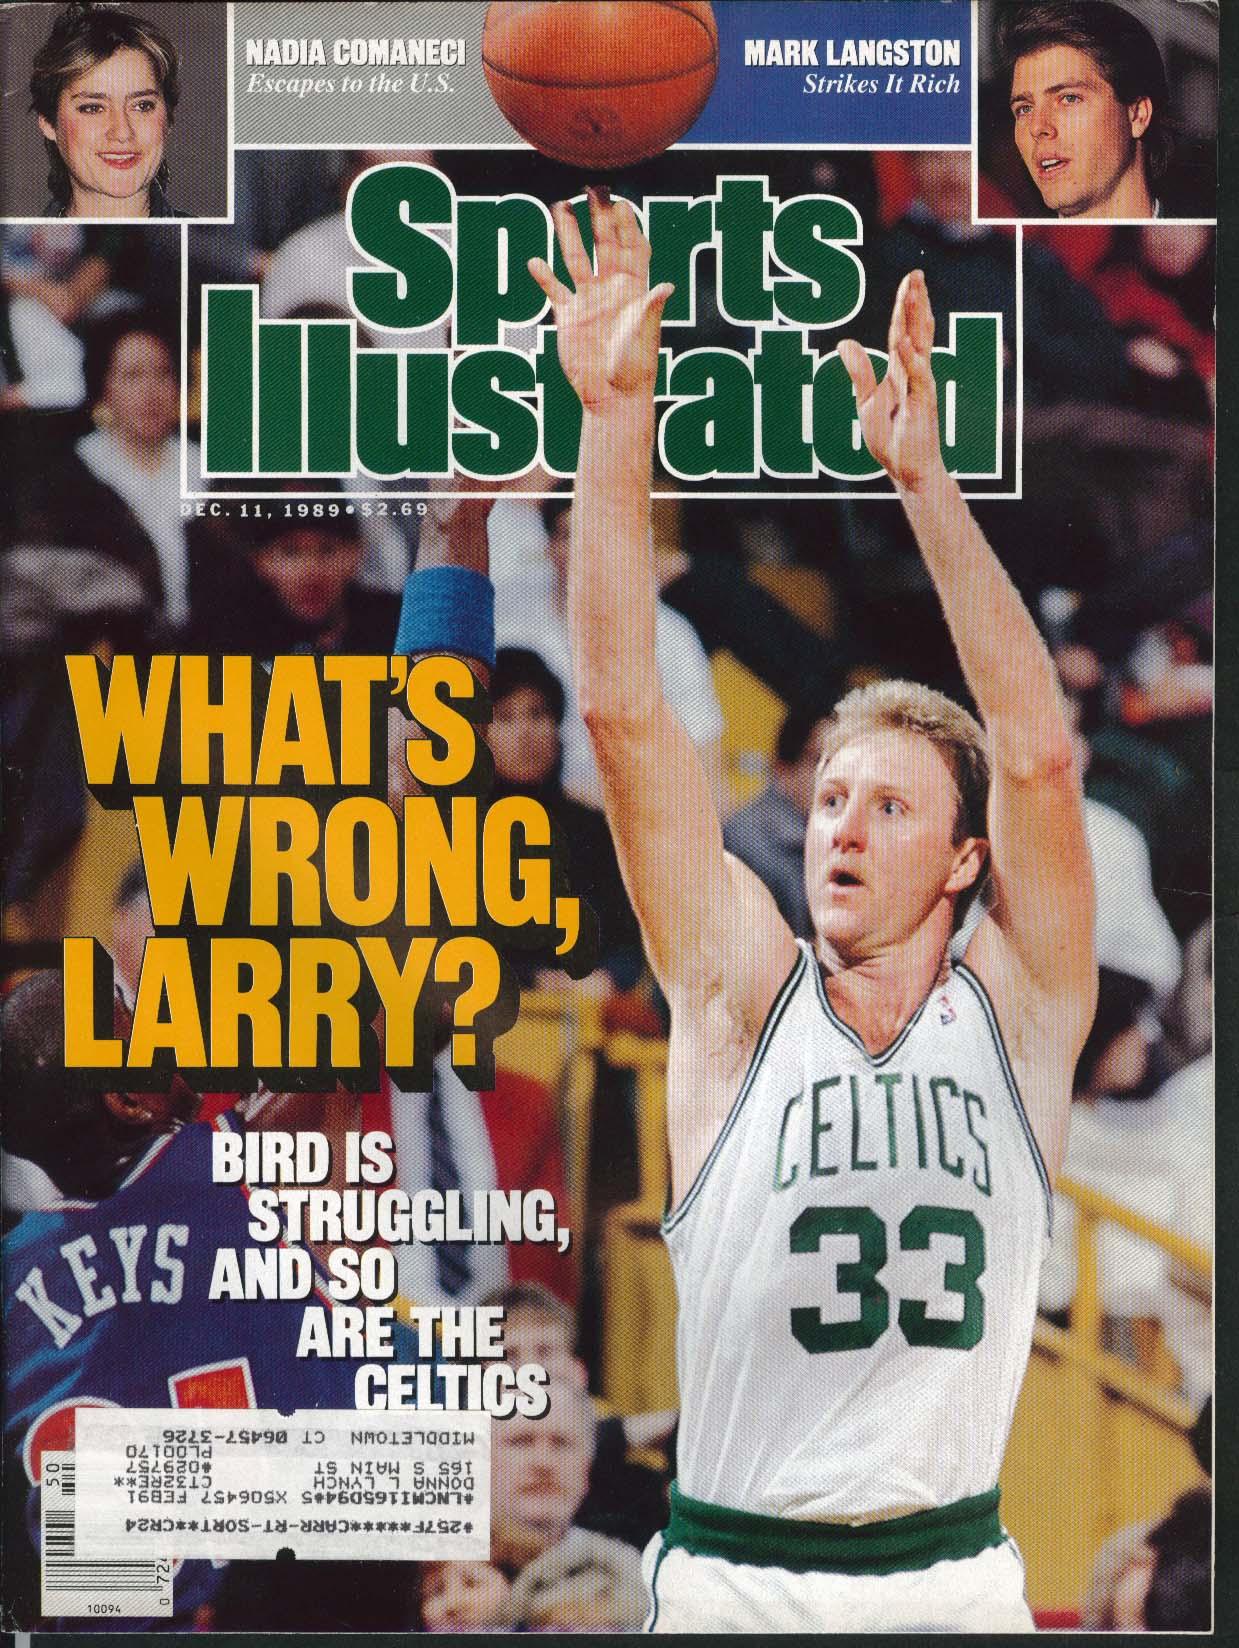 SPORTS ILLUSTRATED Larry Bird Nadia Comaneci Mark Langston 12/11 1989